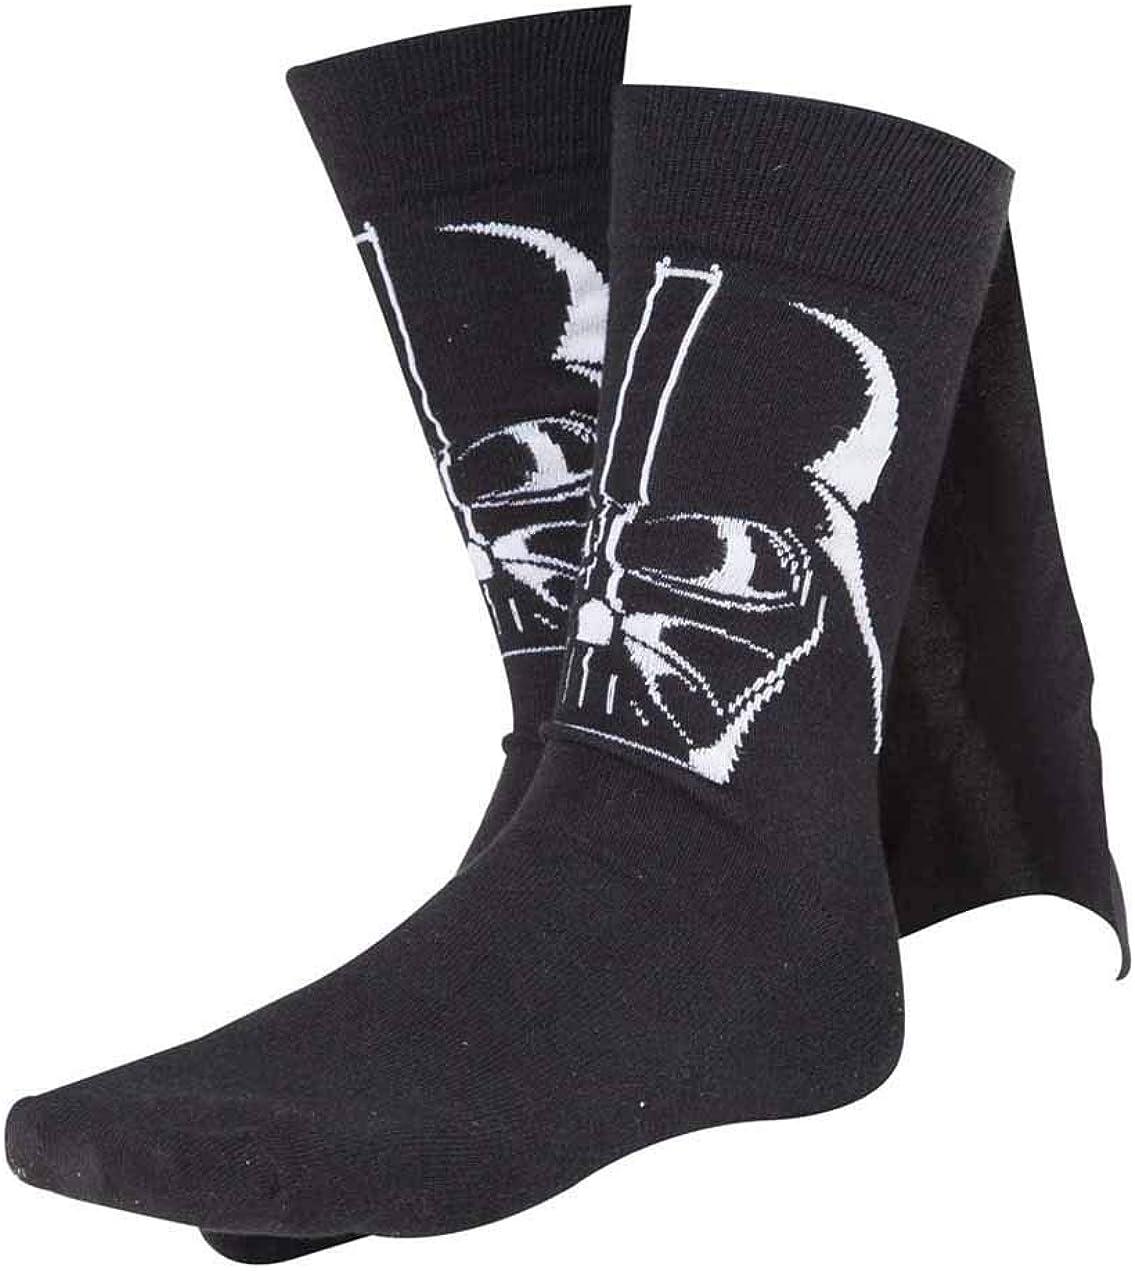 Meroncourt Darth Vader Cape Calcetines para Hombre